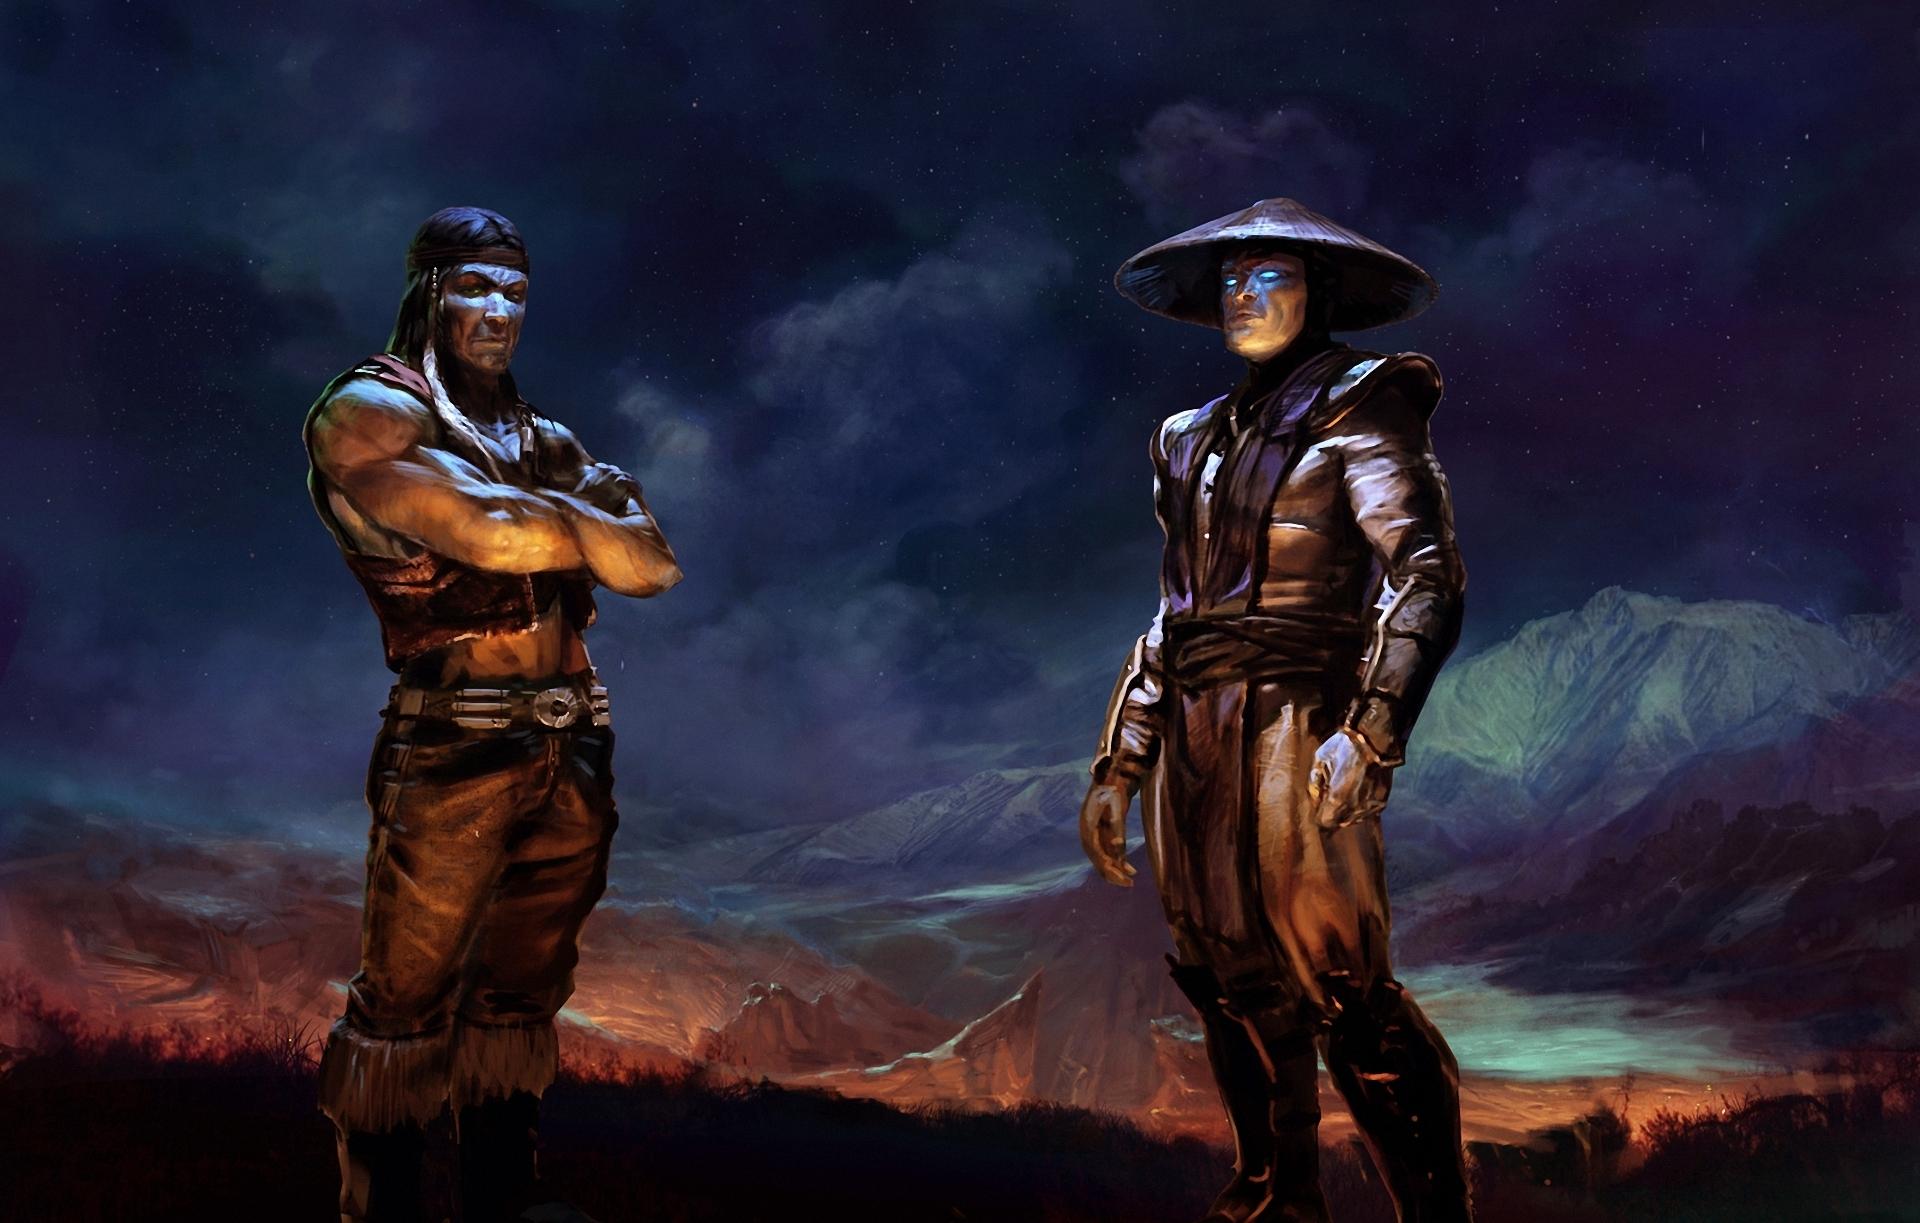 Mortal Kombat Men Warriors Games warrior warriors wallpaper background 1920x1223